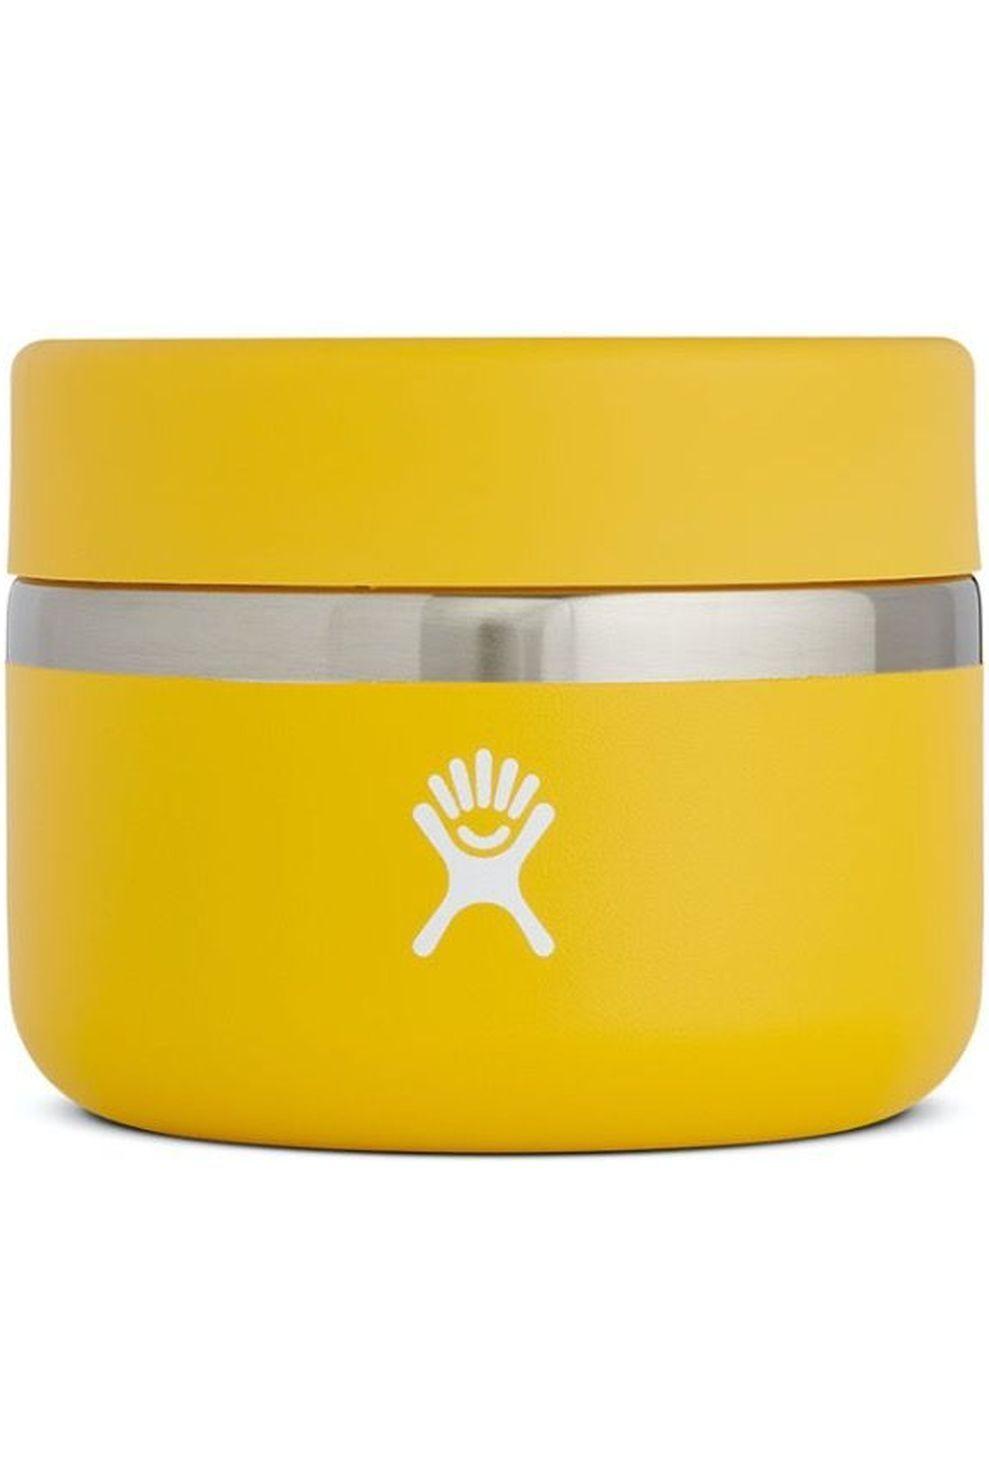 Hydro Flask Voorraadpot 12 Oz Insulated Food Jar - Geel